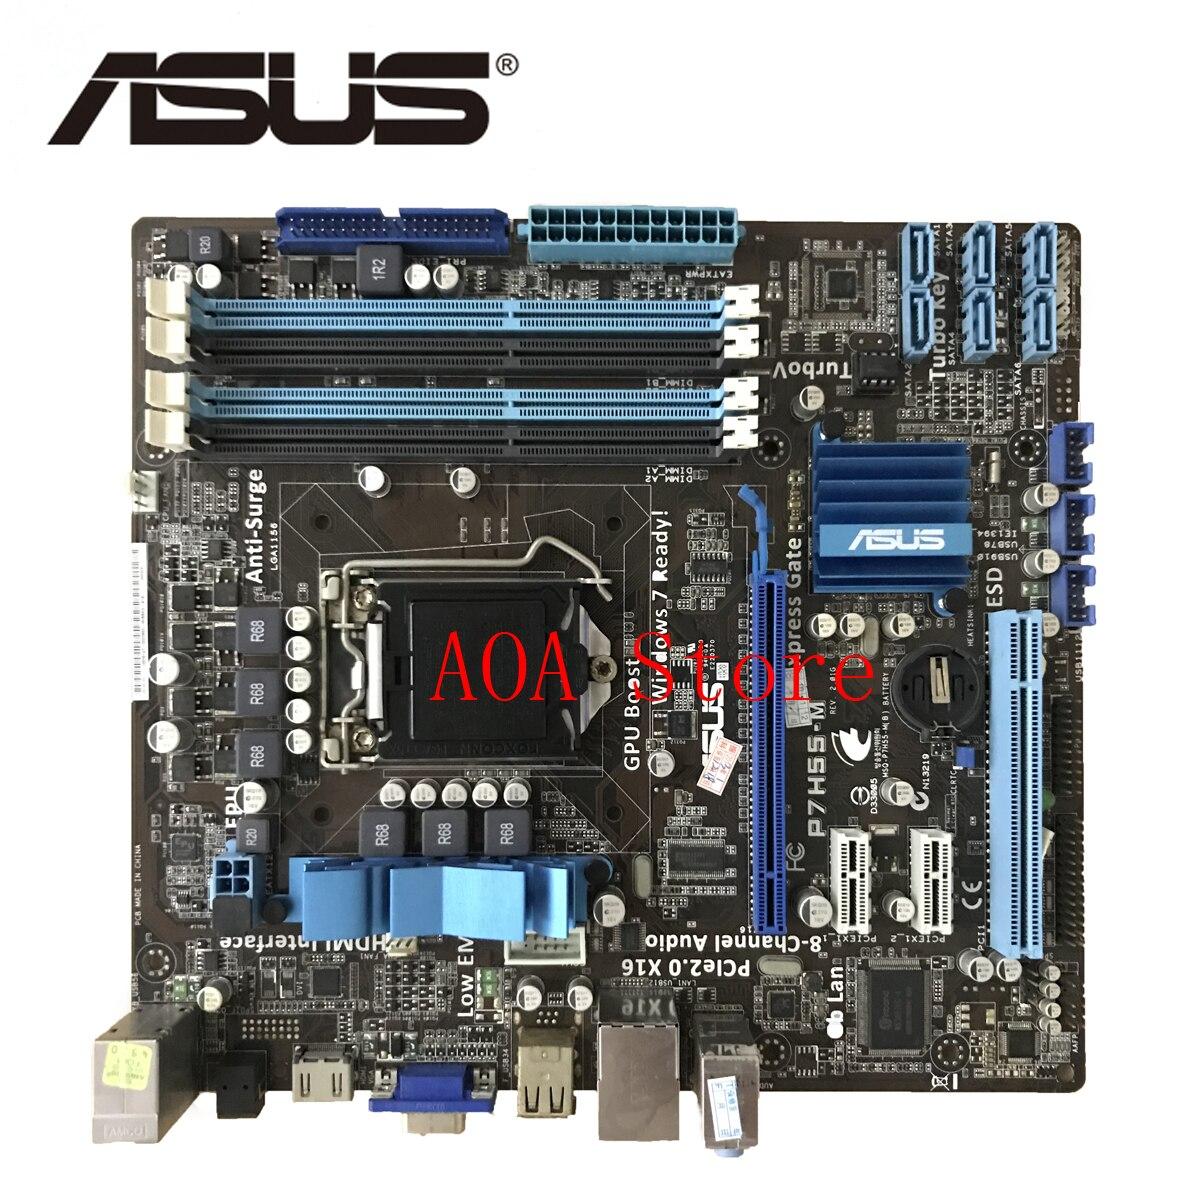 Socket LGA 1156 para Intel H55 ASUS P7H55-M Original placa madre hembra uATX HDMI VGA 4 DDR3 16 GB placa base de escritorio p7H55M